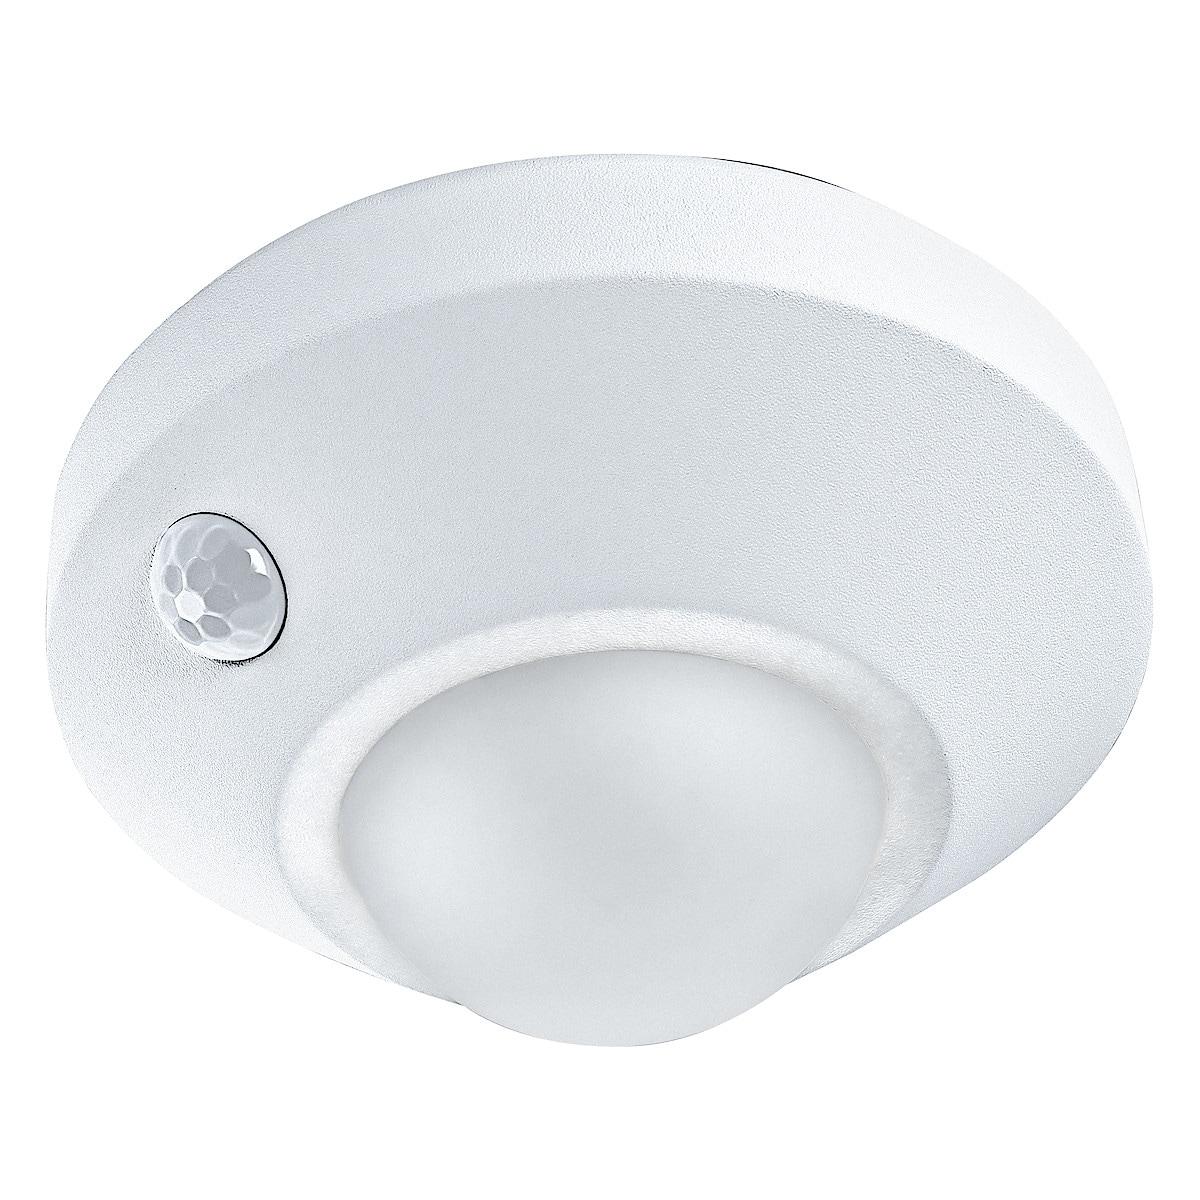 LED-belysning Nightlux Ceiling med sensor Osram